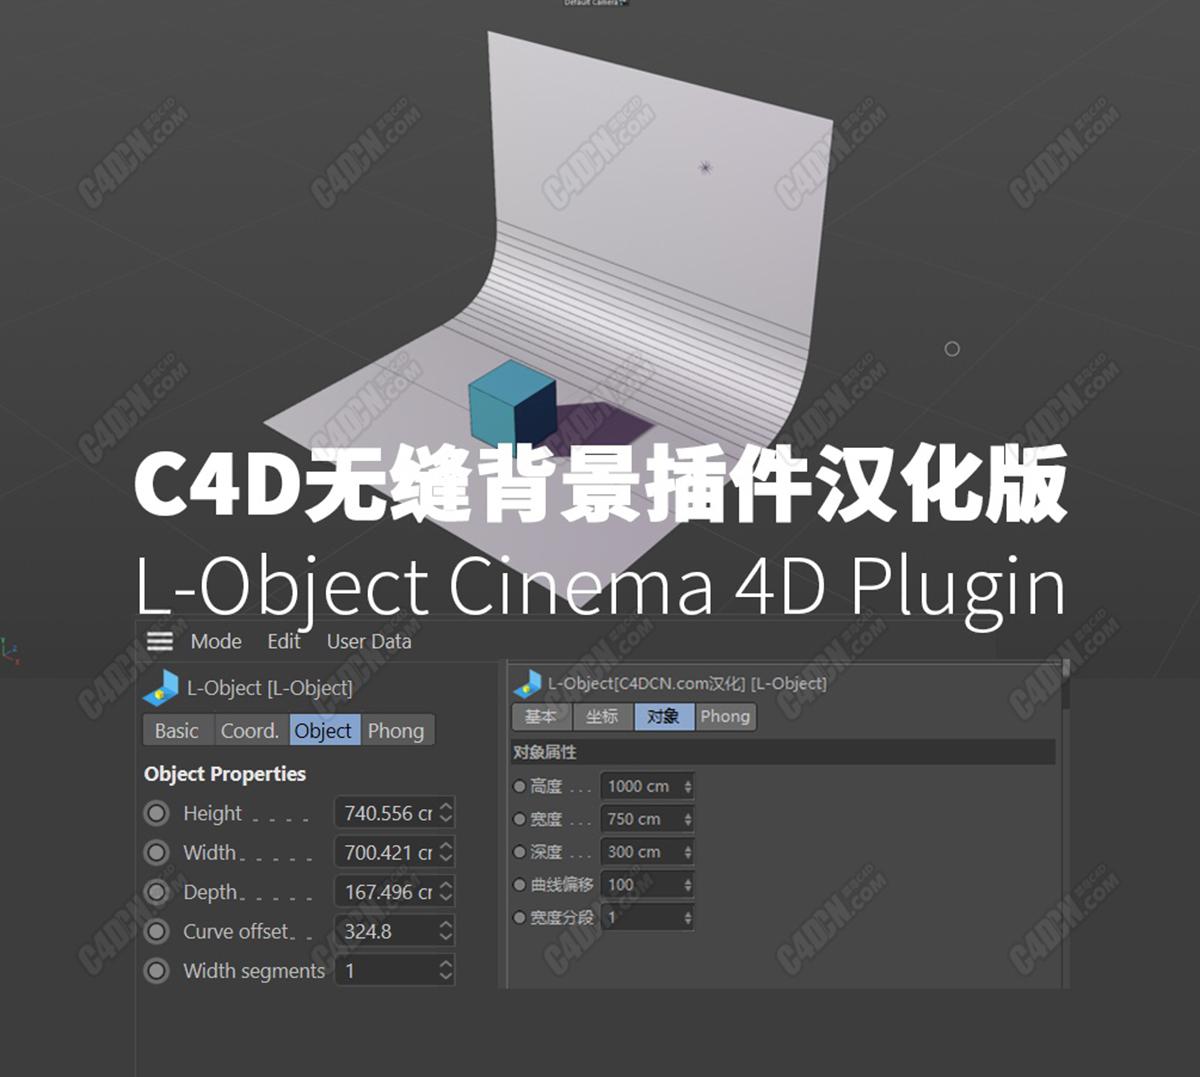 C4D无缝背景生成插件中文汉化版 L-Object Cinema 4D Plugin